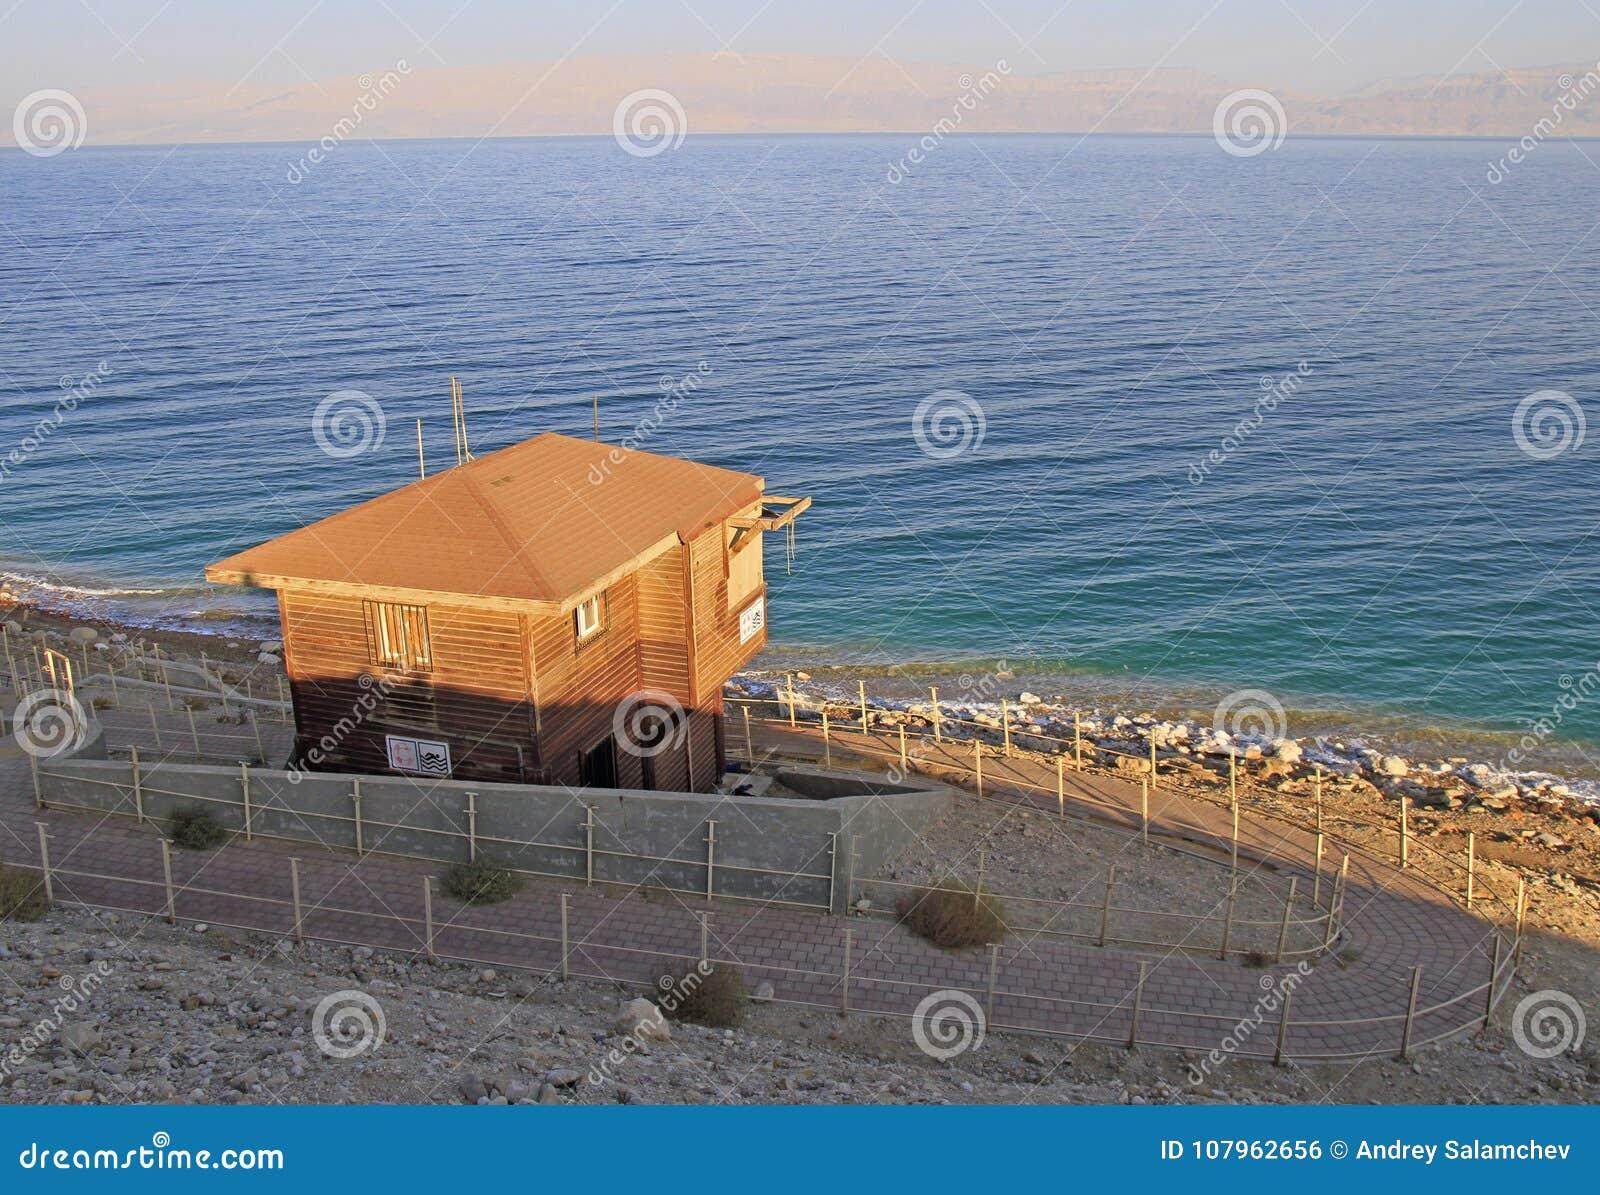 Abandoned Lifeguard Hut On The Coastline Of Dead Sea Stock Photo